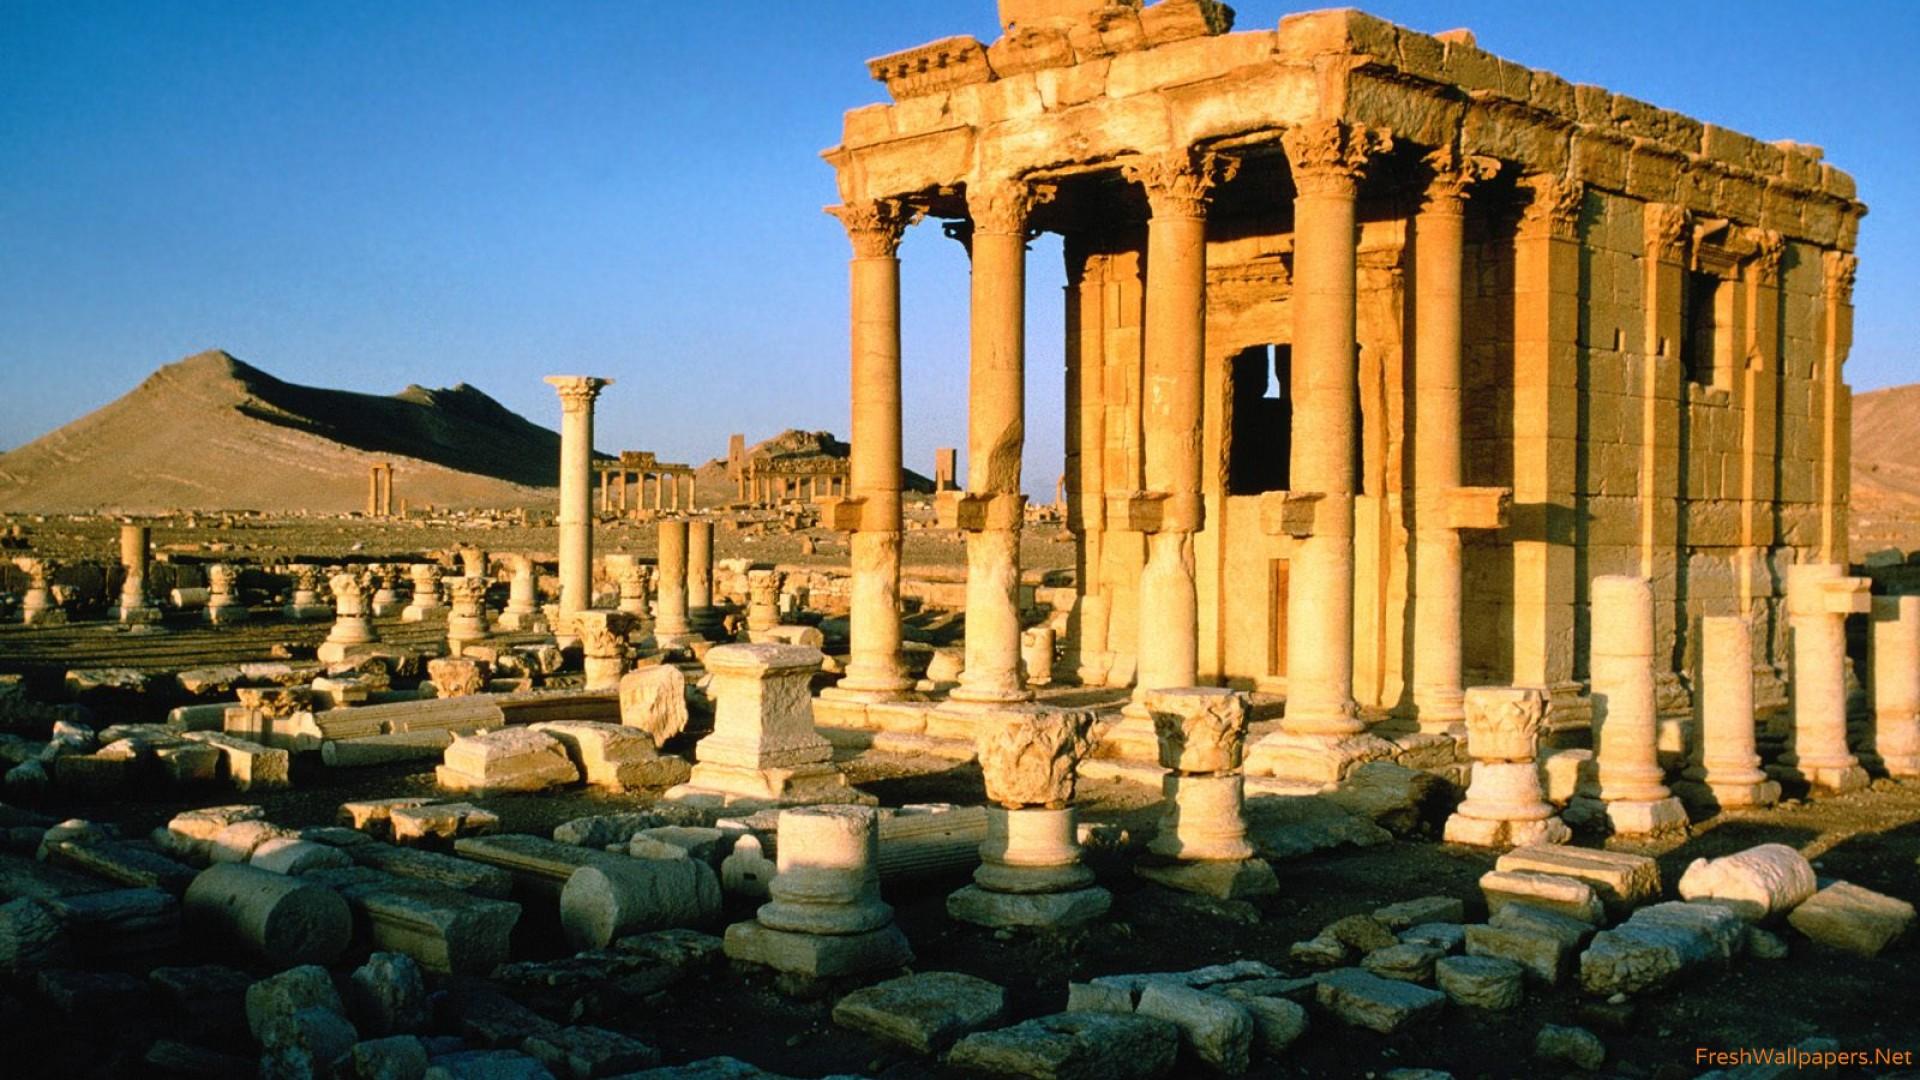 Palmyra Ruins Syria wallpapers Freshwallpapers 1920x1080